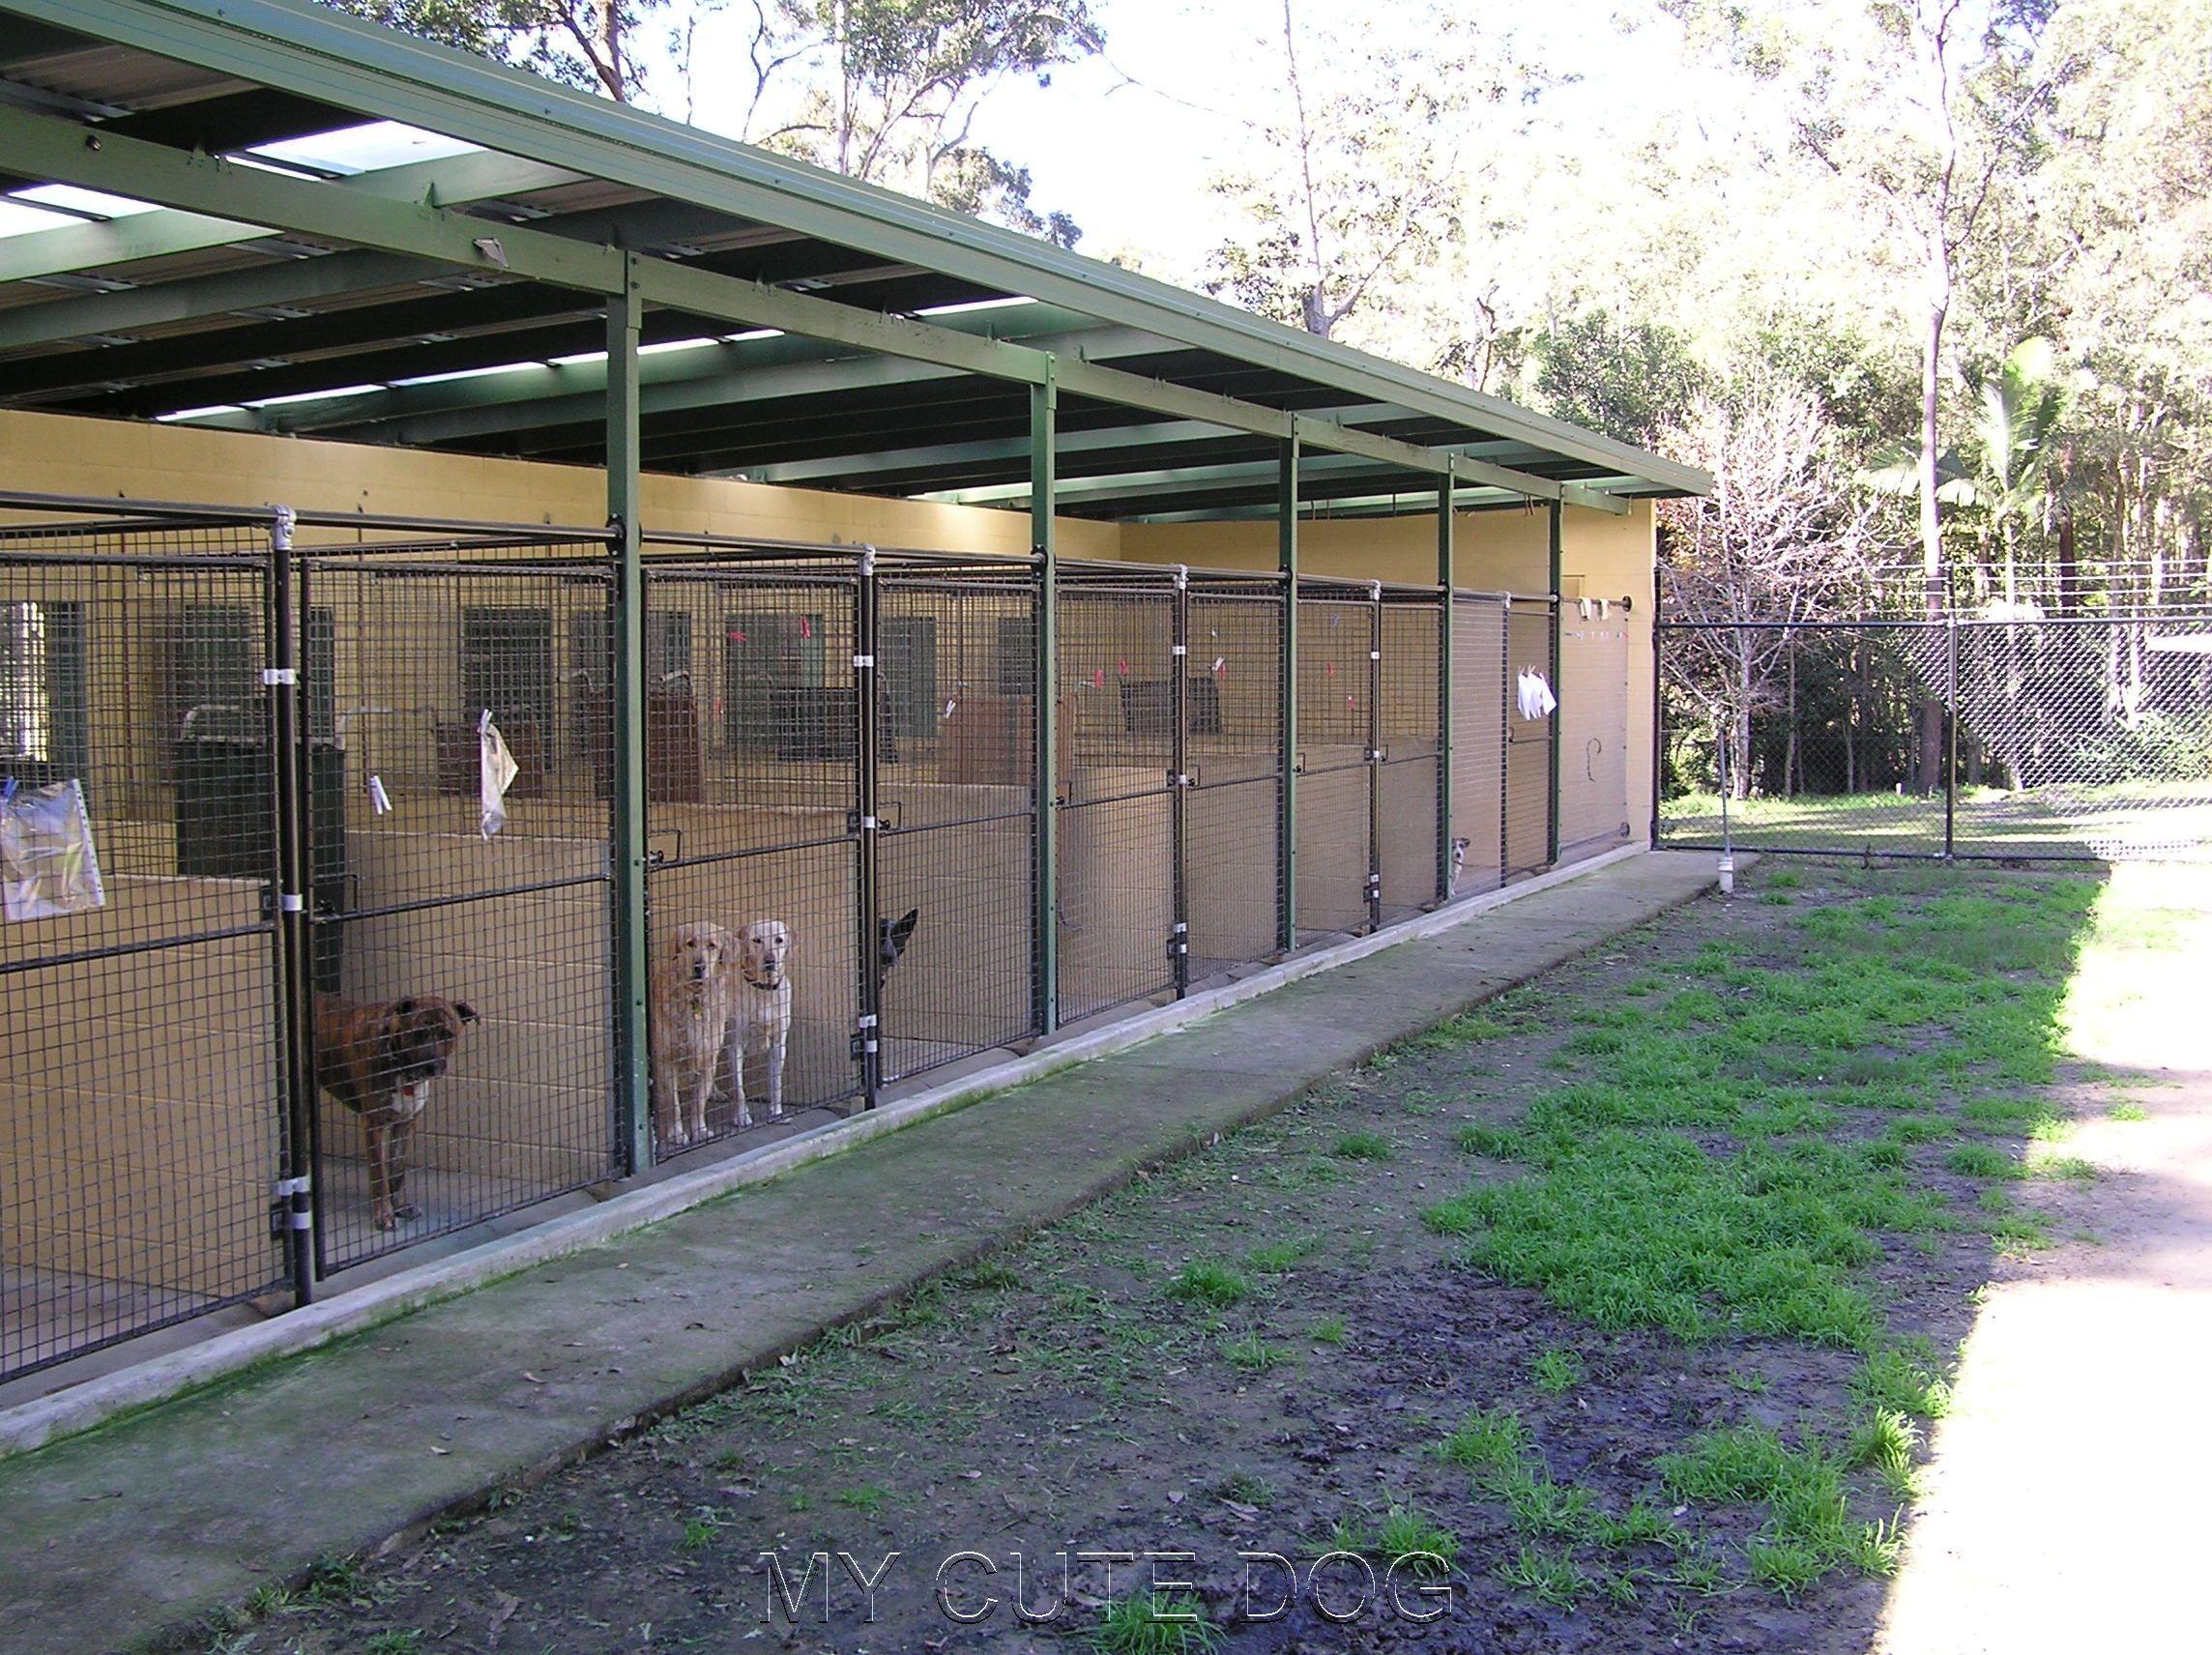 44 Outdoor Dog Kennel Ideas Canis Casotas Para Caes Canil Backyard dog kennel ideas